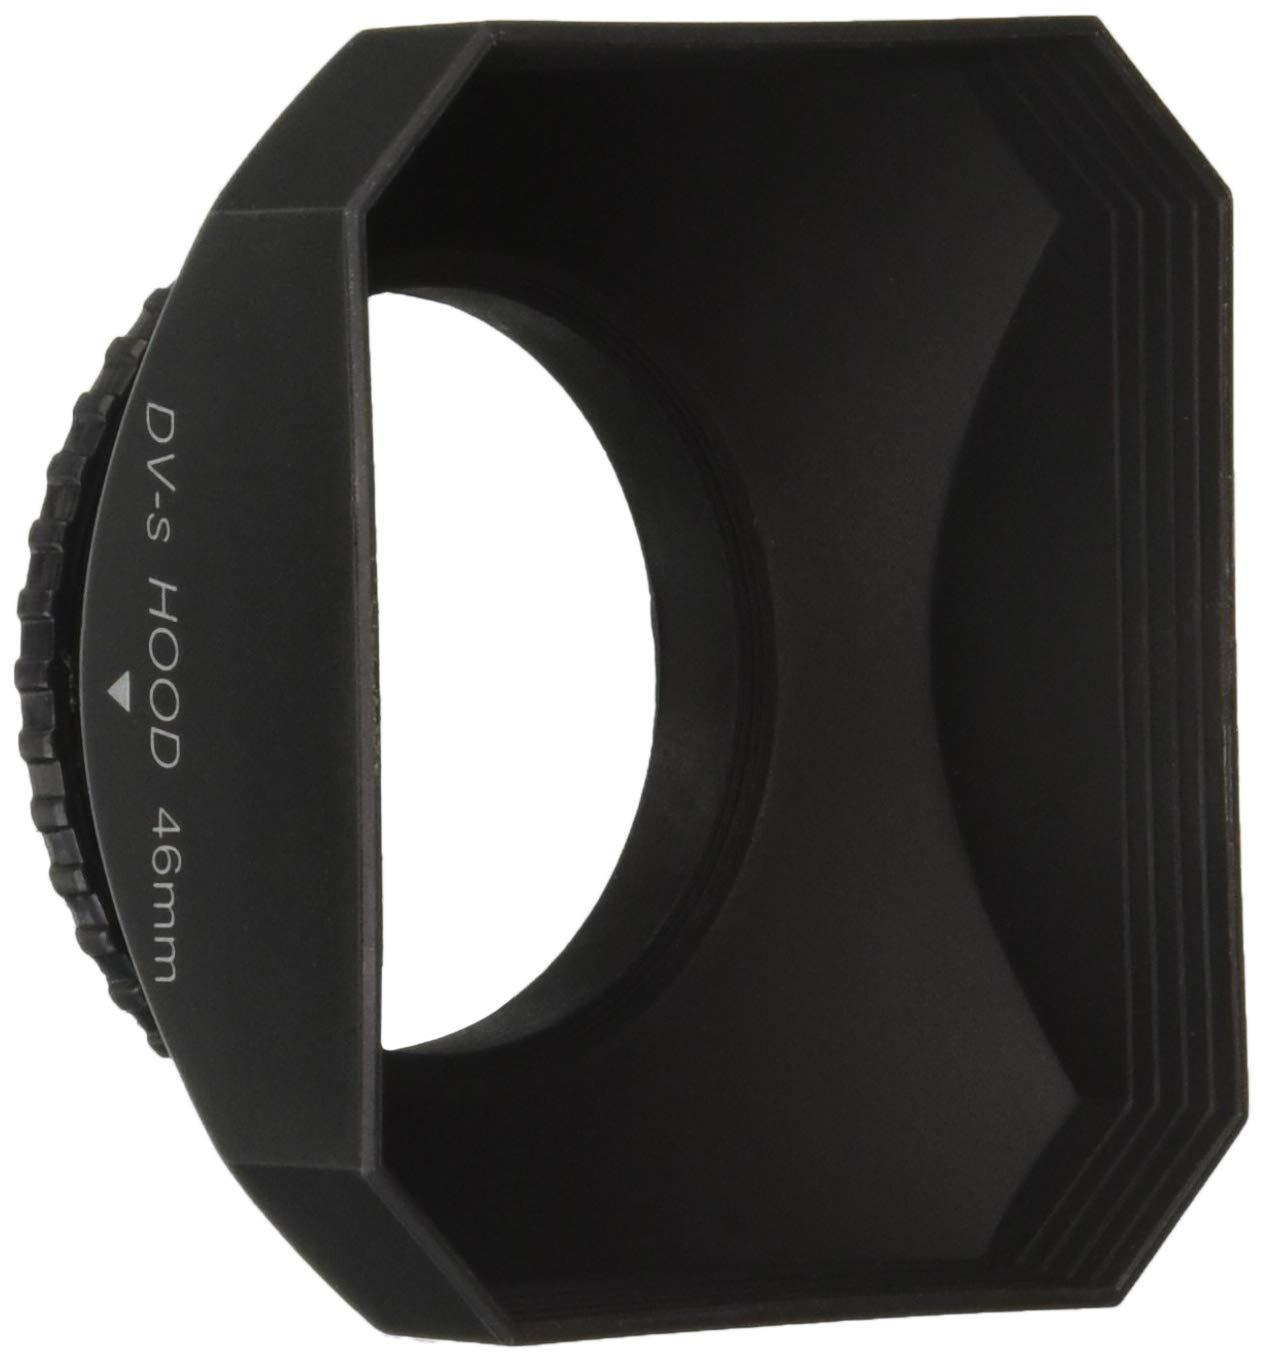 CowboyStudio 46mm DV-s DV Screw Mount Lens Hood with Cap for Digital Video Camera and Camcorder, Sun Shade